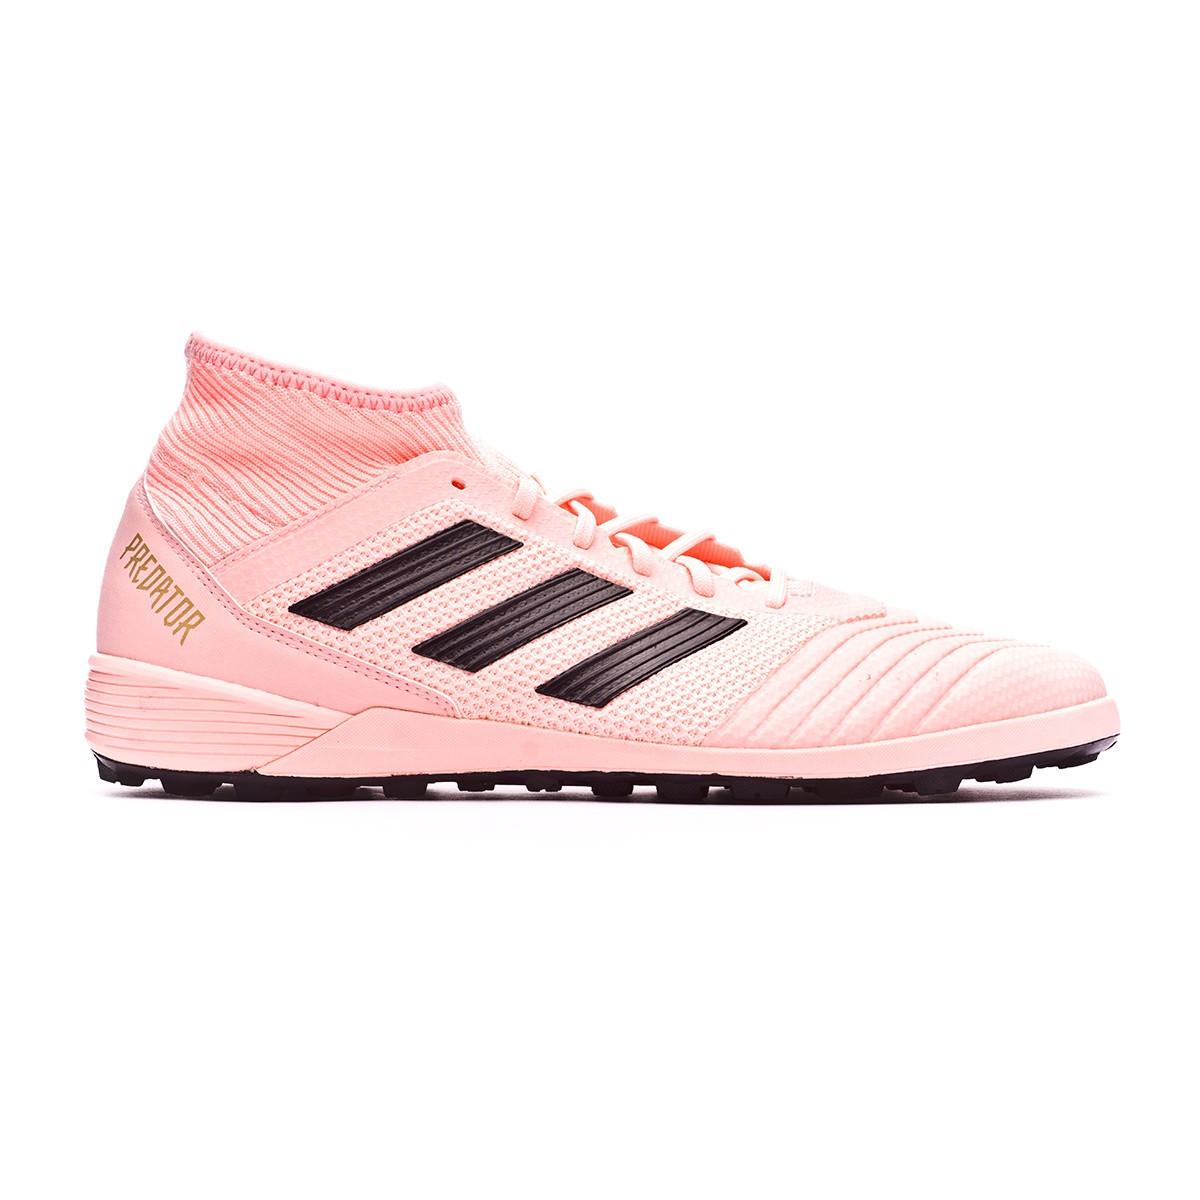 7f1c73b12020 Football Boot adidas Predator Tango 18.3 Turf Clear orange-Black-Trace pink  - Football store Fútbol Emotion